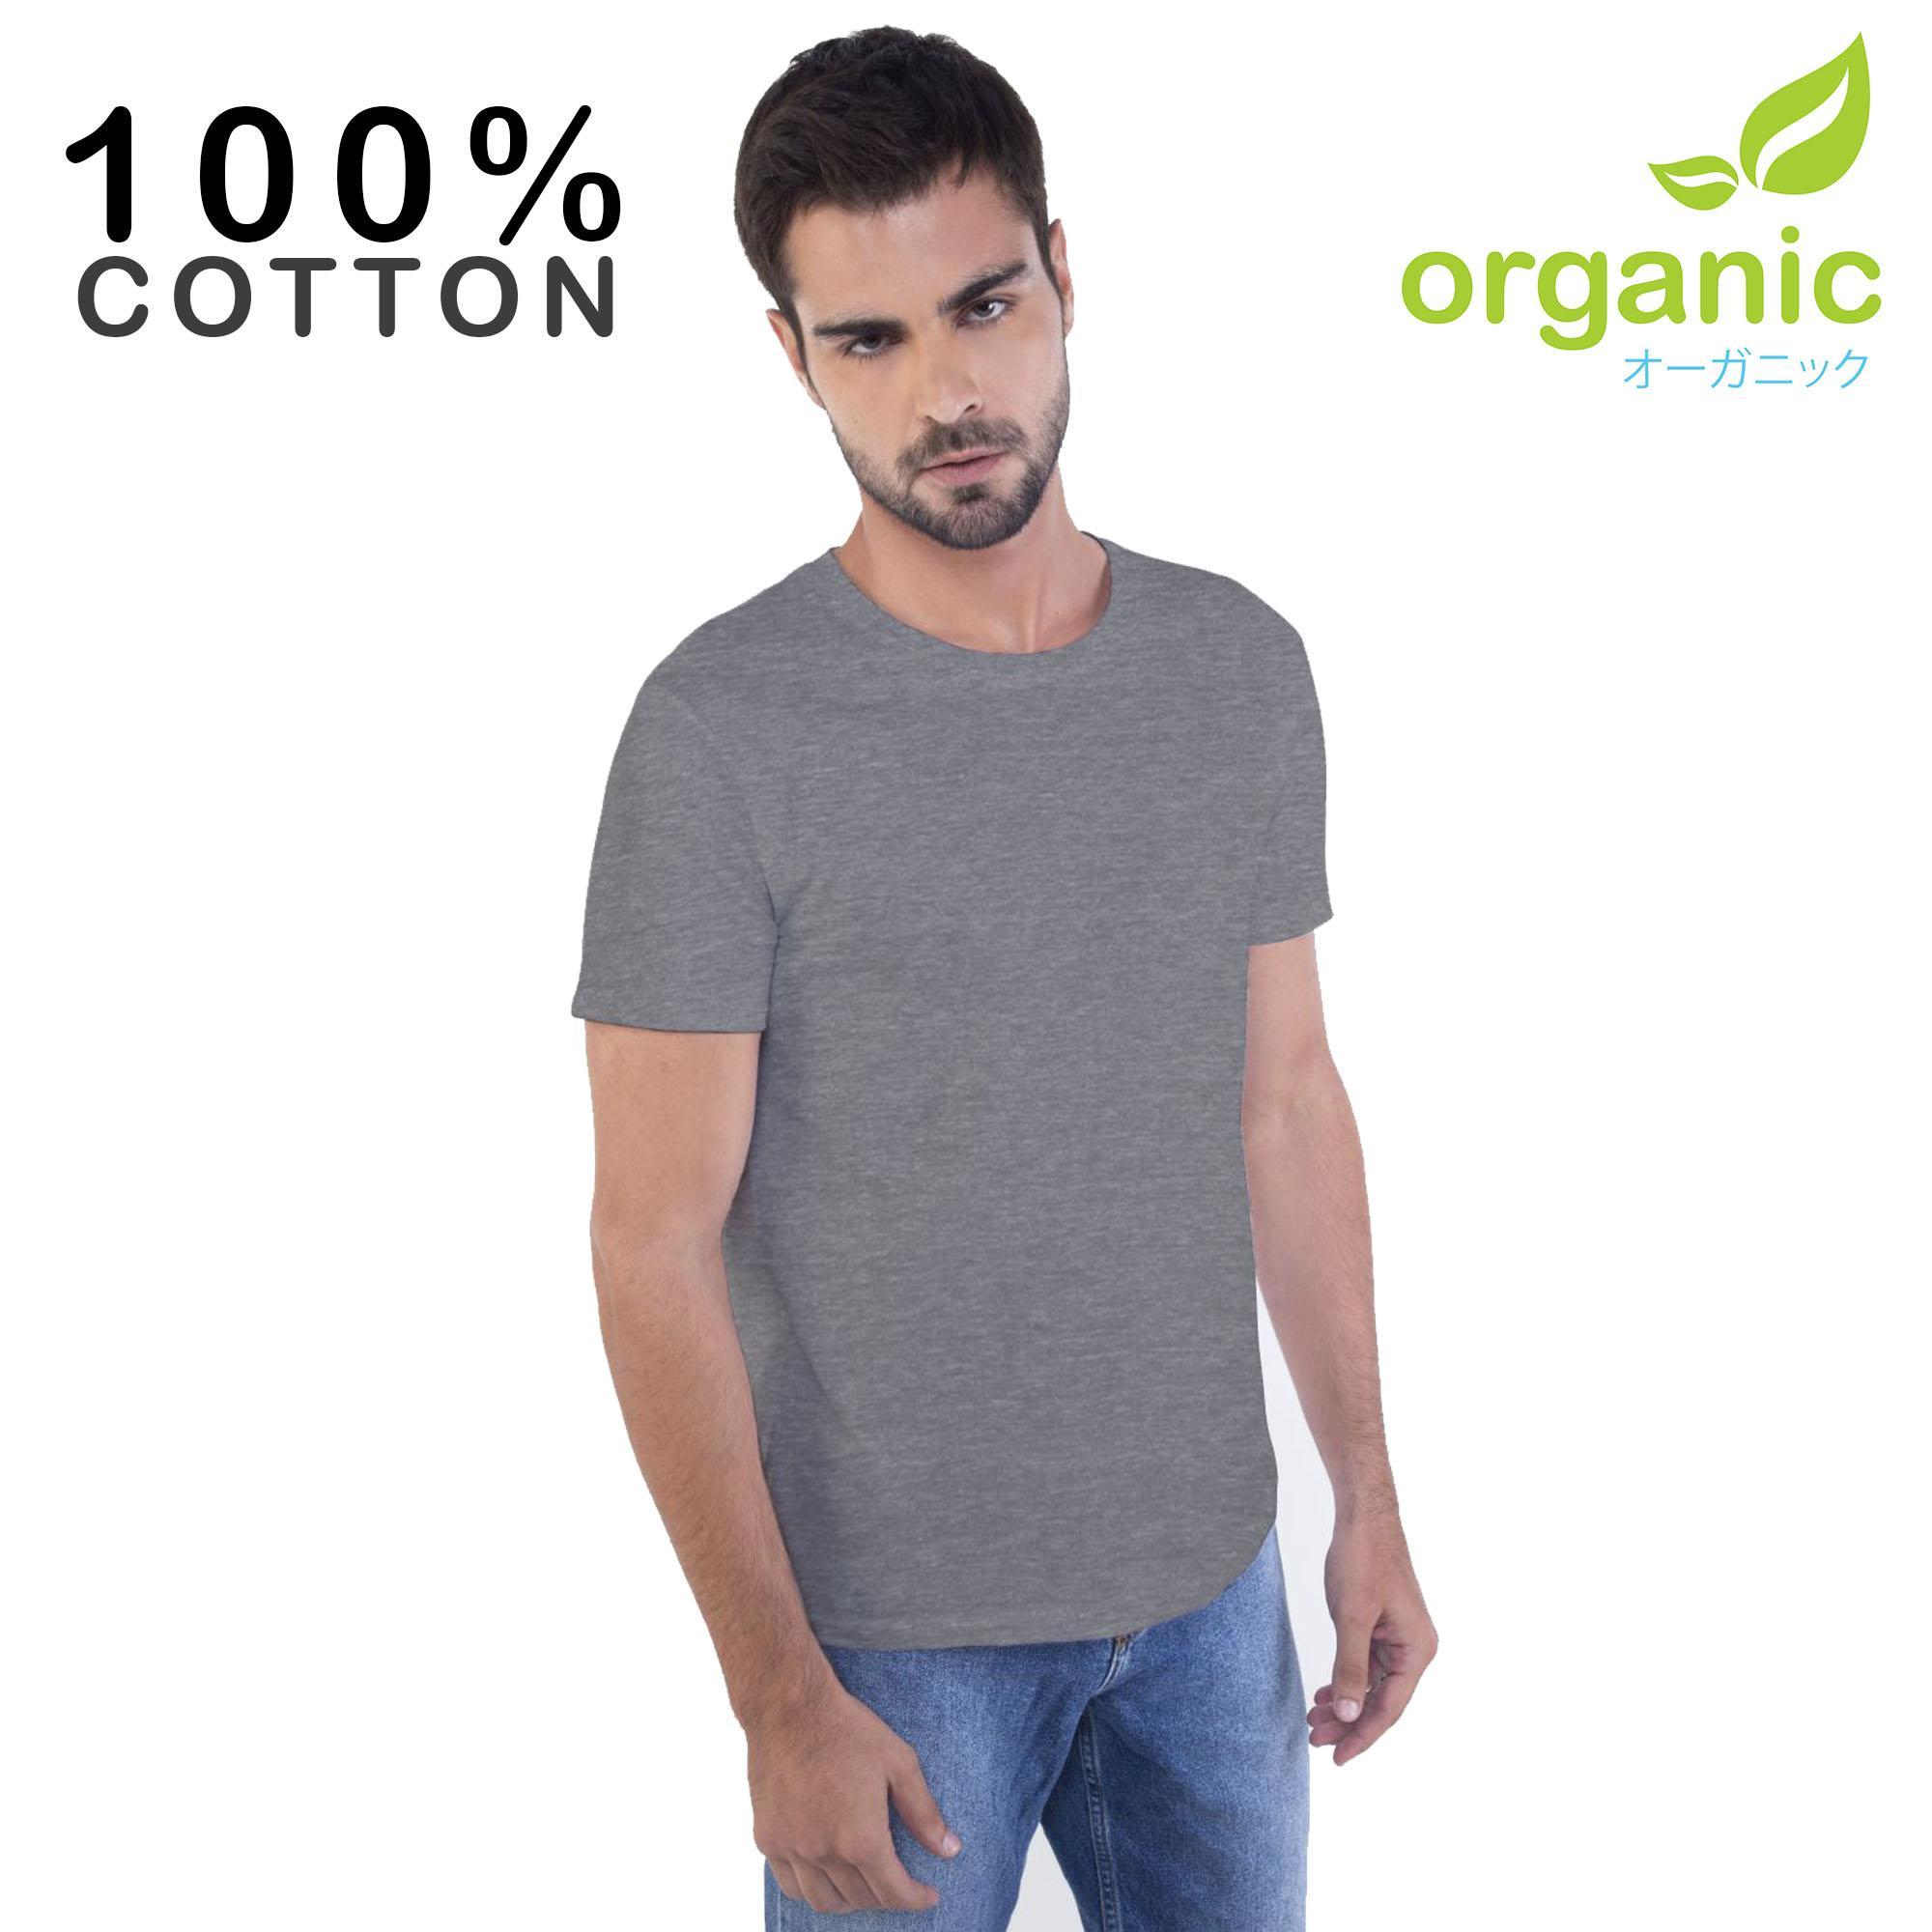 576a56f2f74 Organic Mens 100% Cotton Round neck Tees t shirt tshirt shirts tshirts tee  tops top for men